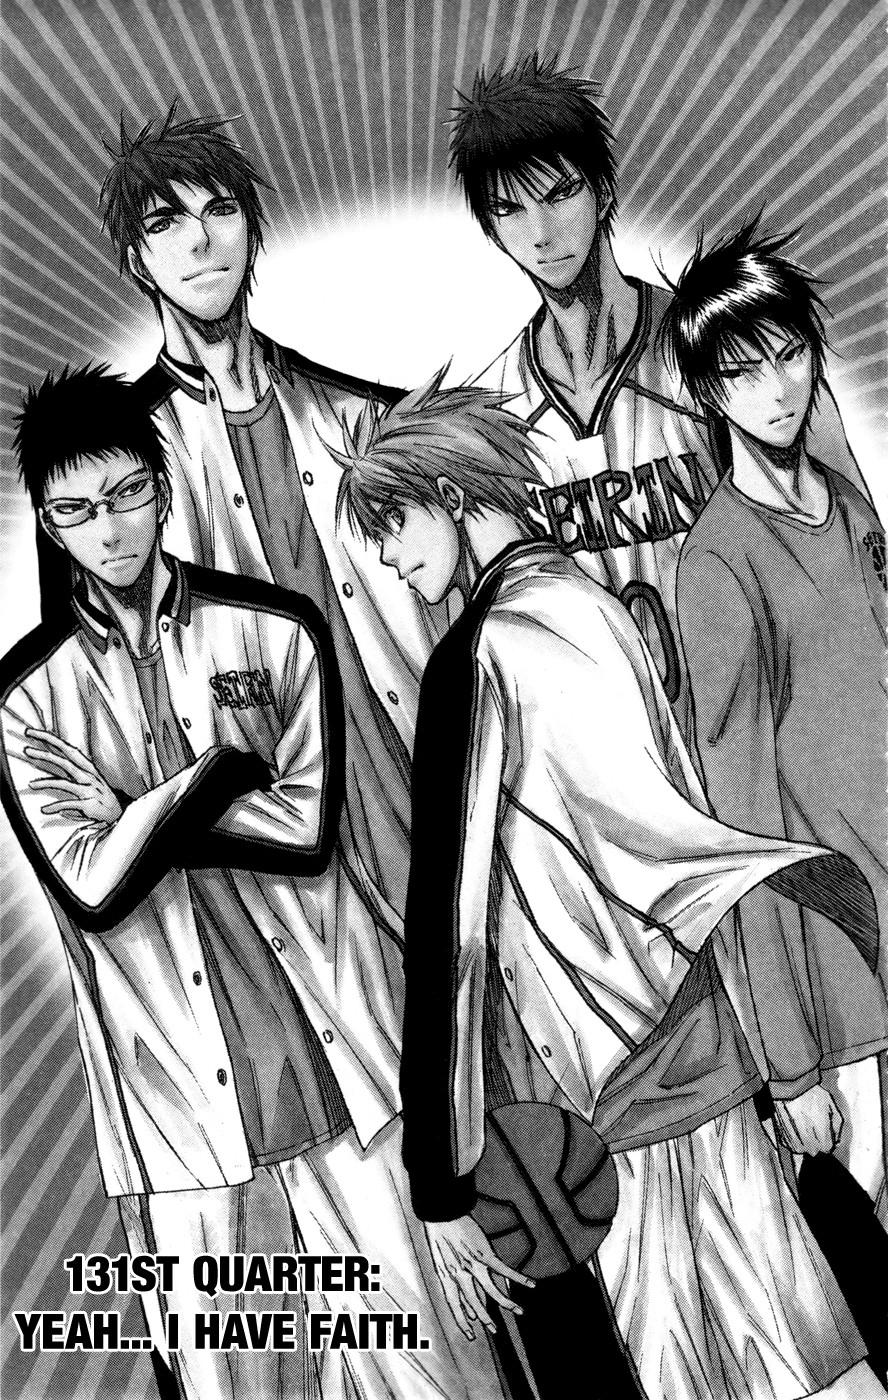 Kuroko no Basket Manga Chapter 131 - Image 01